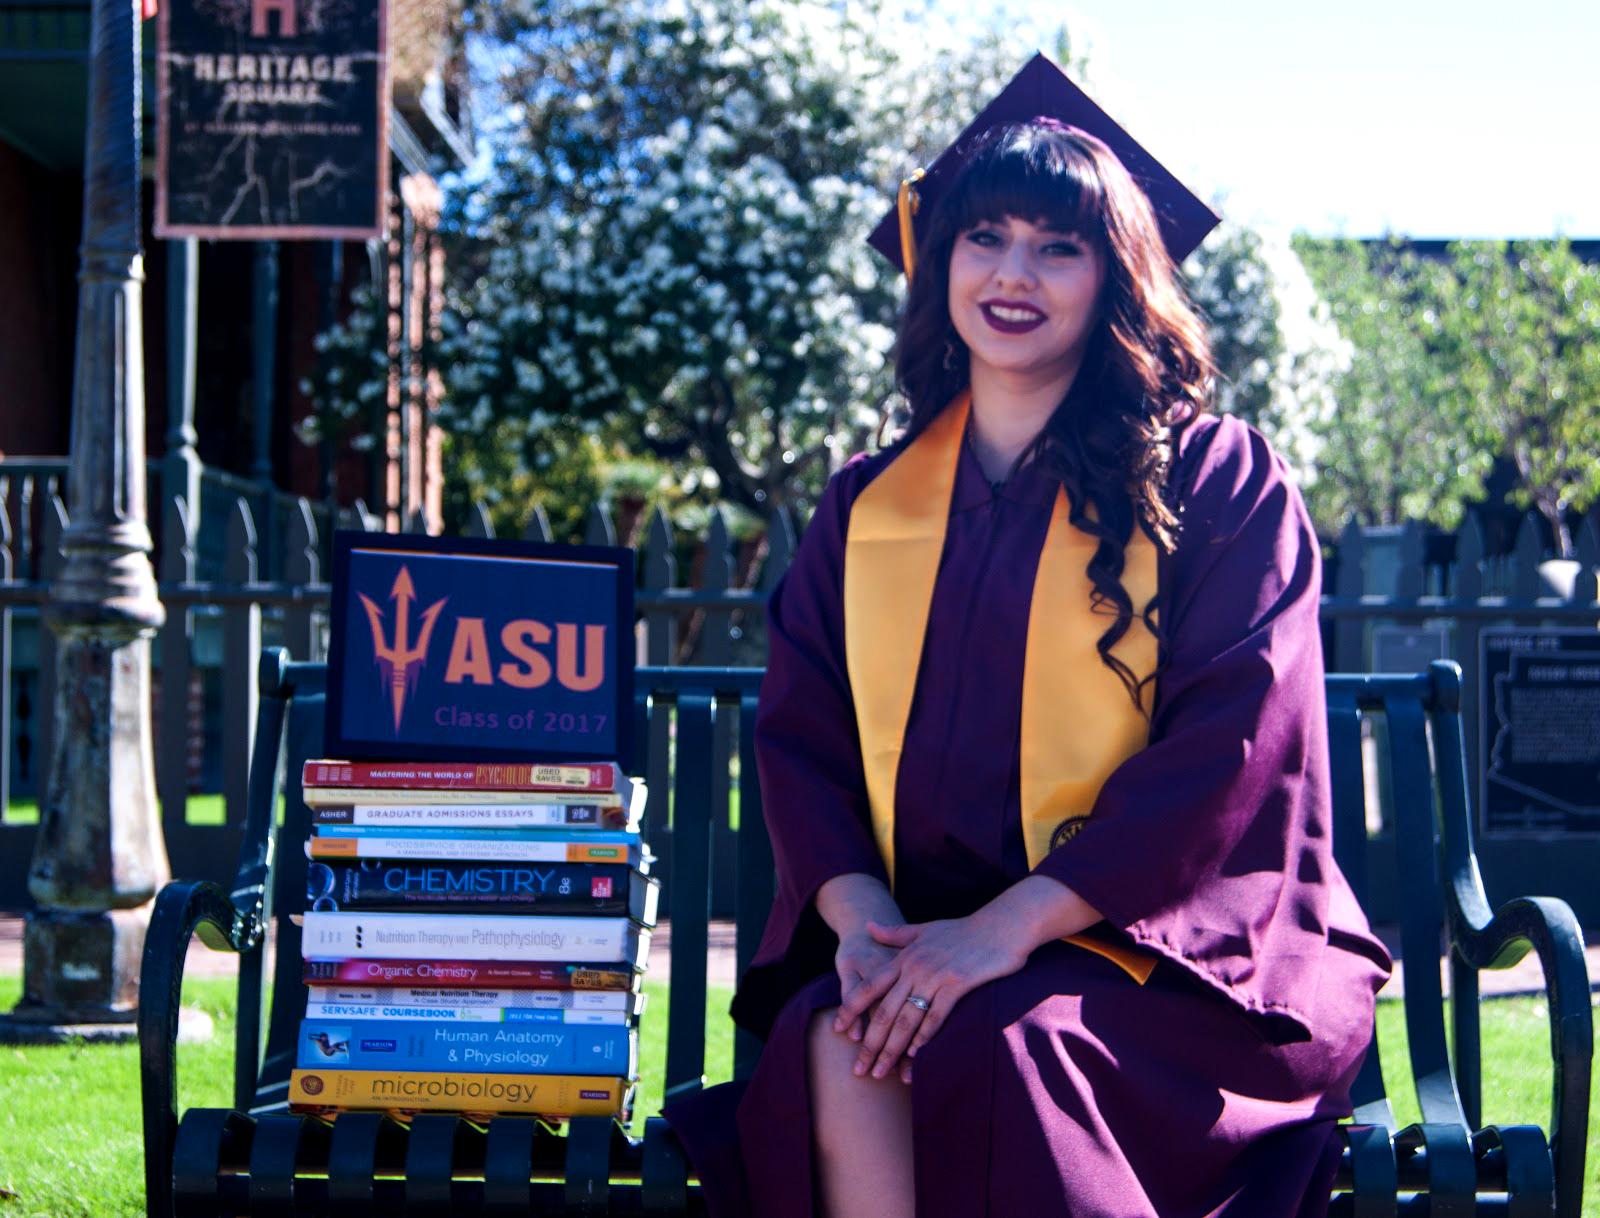 Nancy Dominguez, Nutrition dietetics major